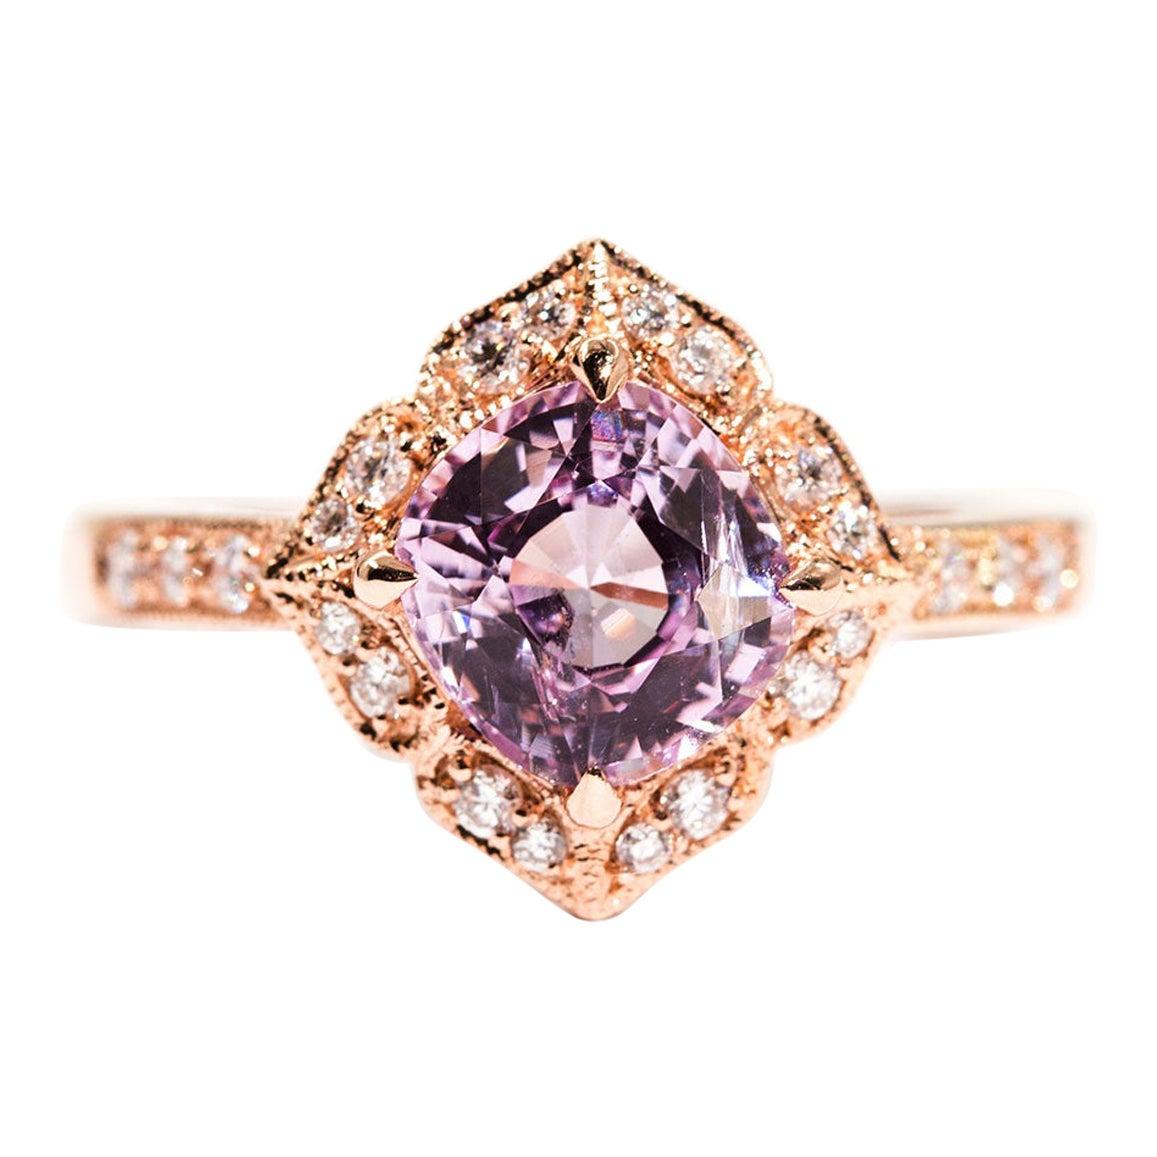 1.97 Carat Cushion Cut Pink Spinel and Diamond 18 Carat Rose Gold Halo Ring